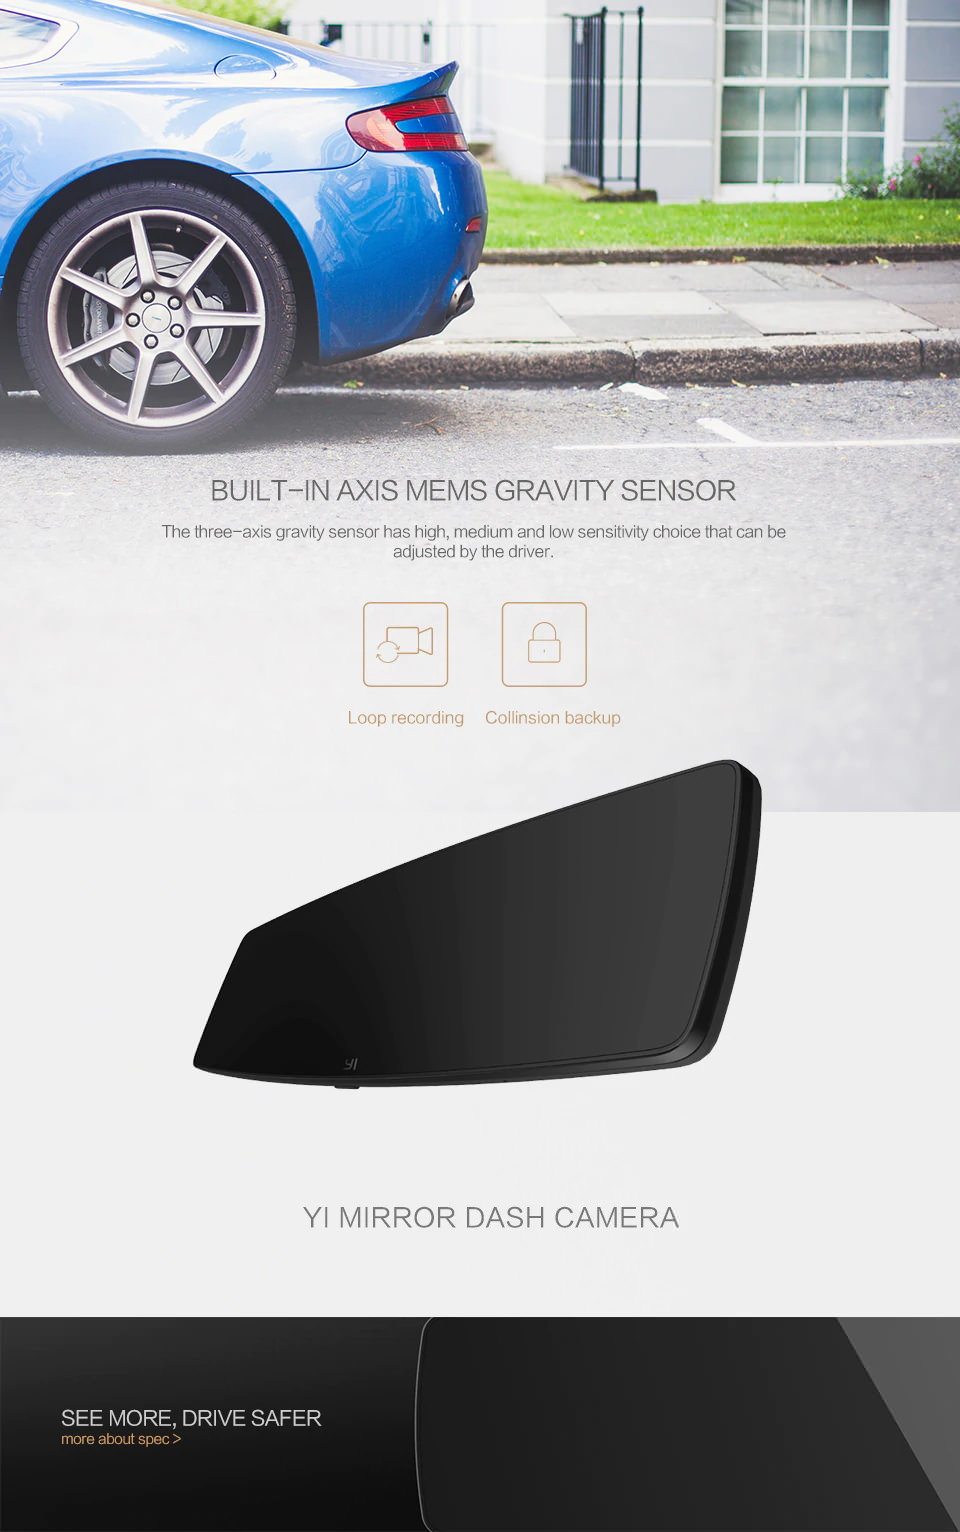 yi mirror dash cam price